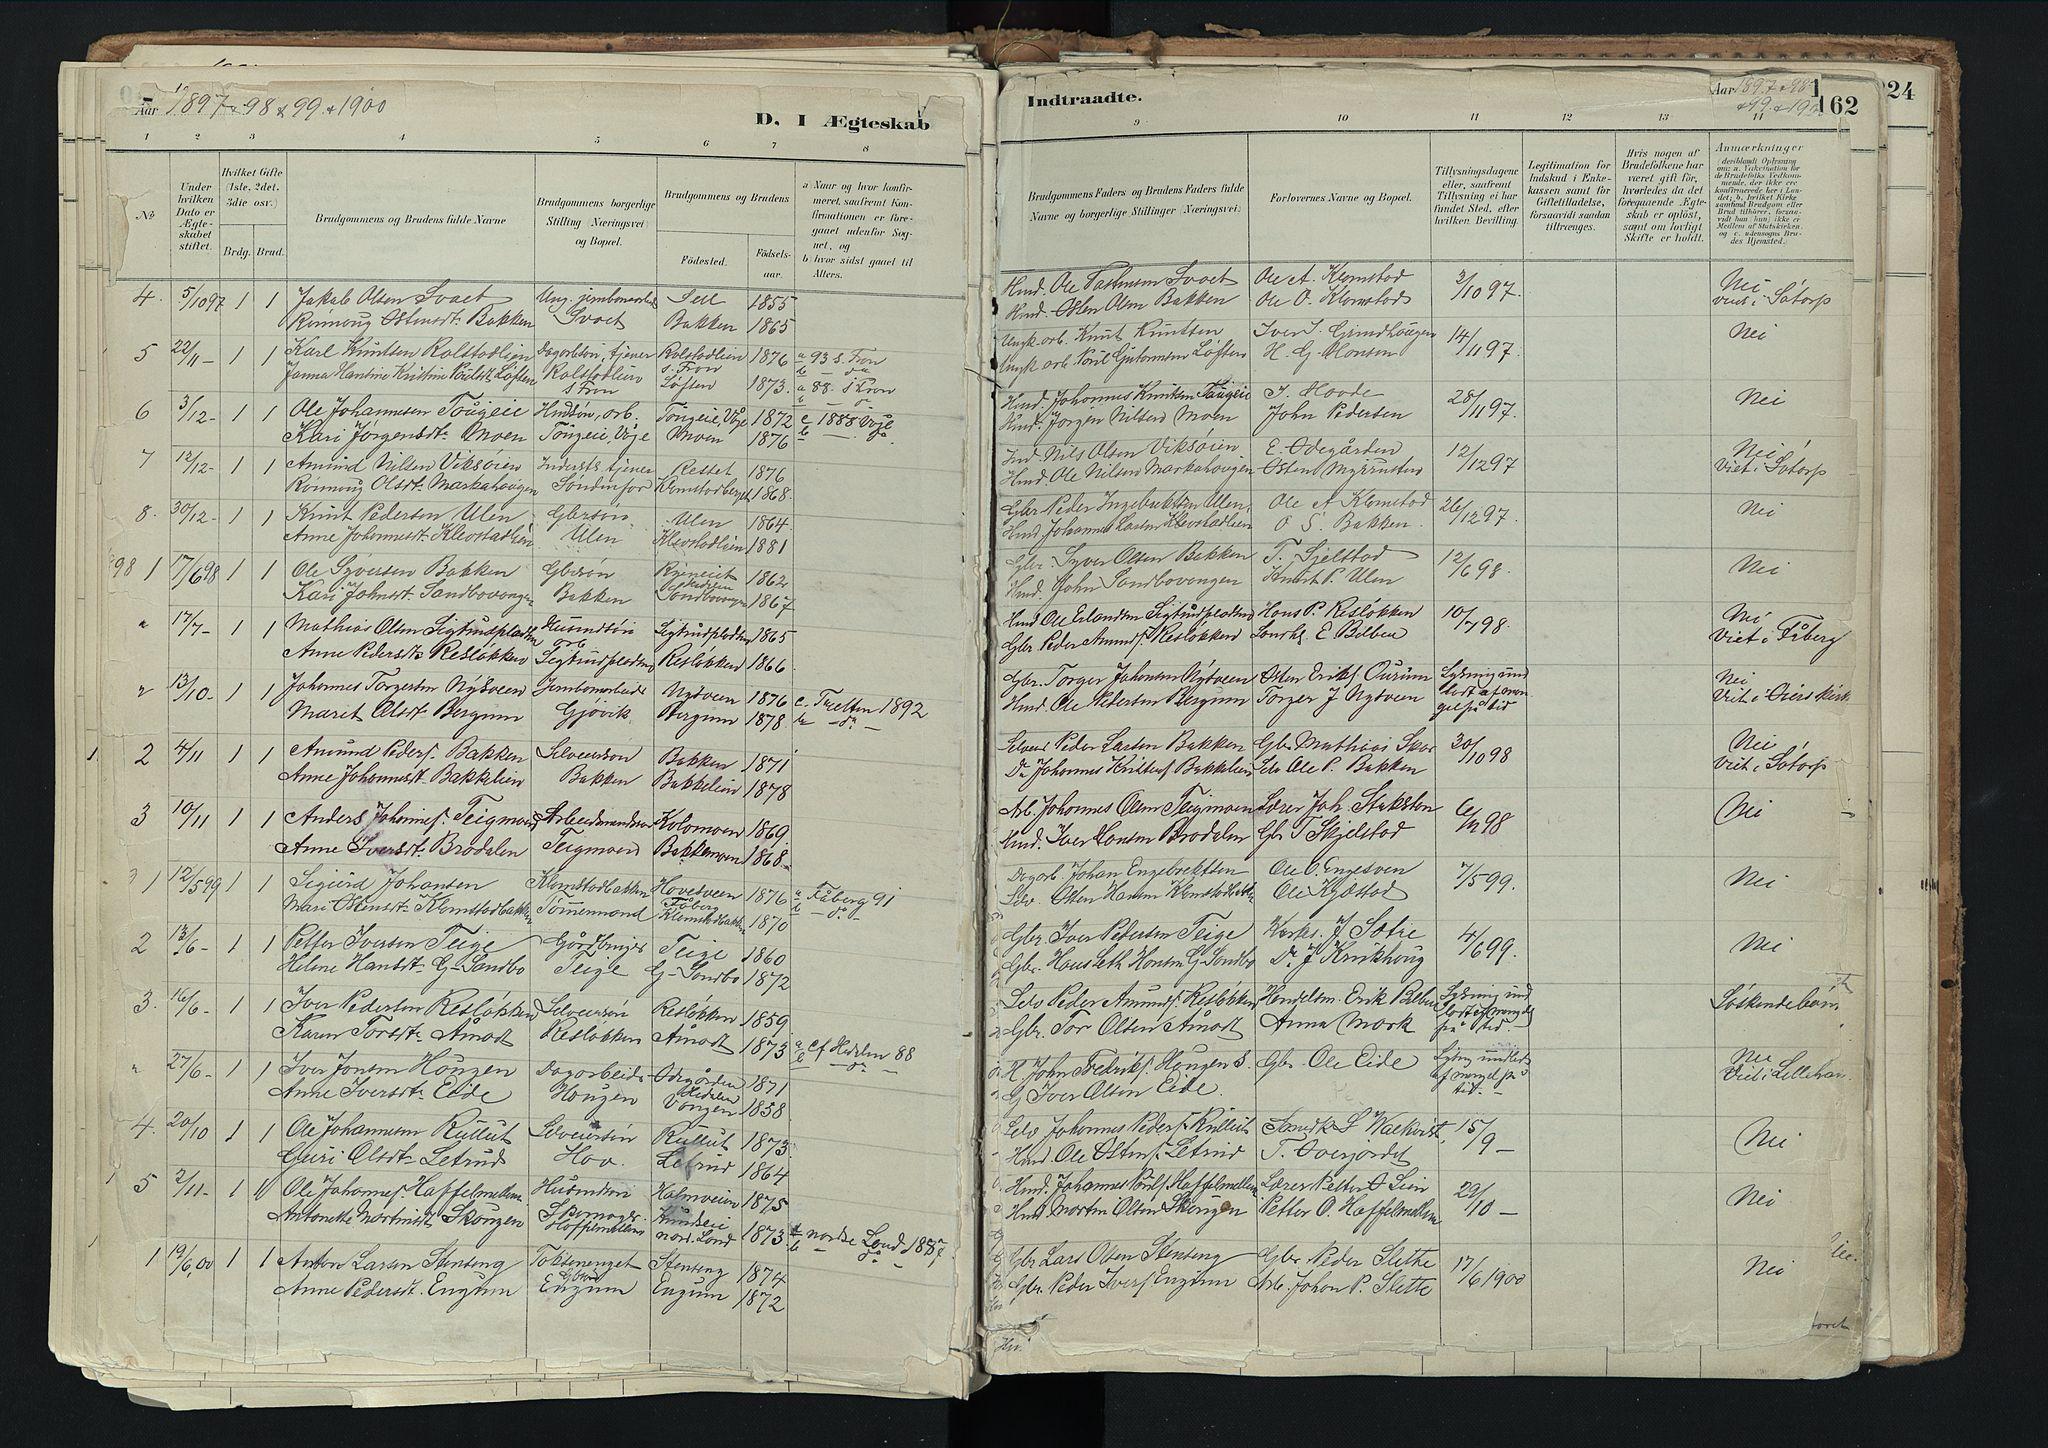 SAH, Nord-Fron prestekontor, Ministerialbok nr. 3, 1884-1914, s. 161